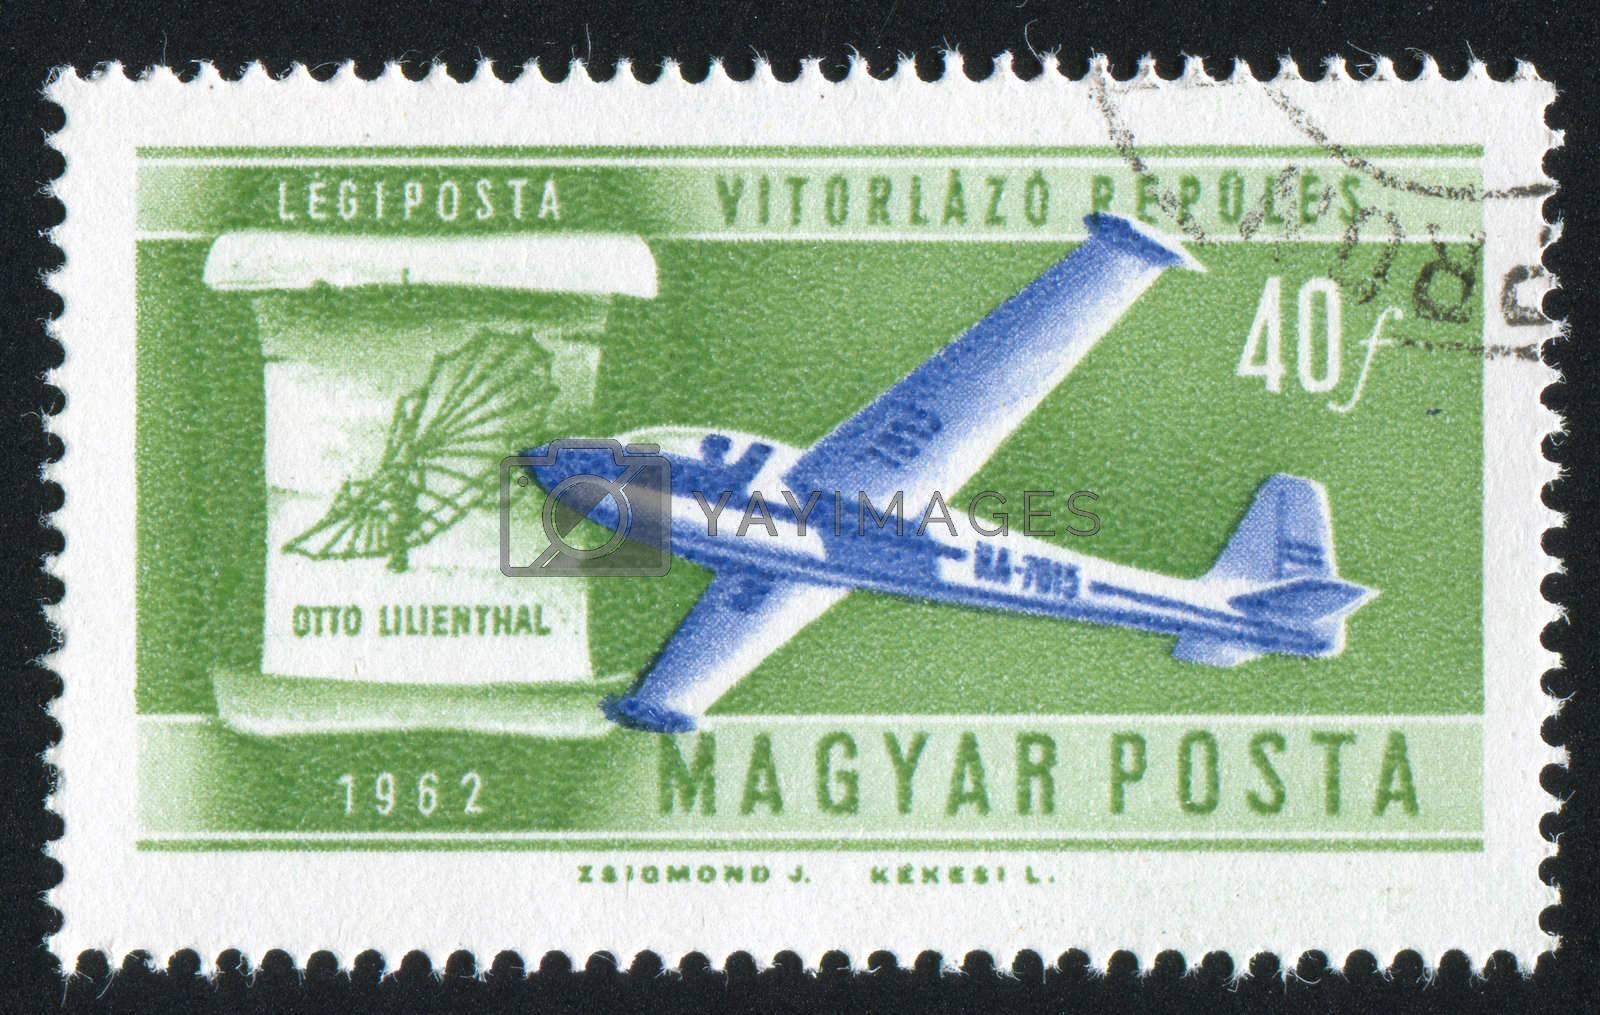 HUNGARY - CIRCA 1962: stamp printed by Hungary, shows plane, circa 1962